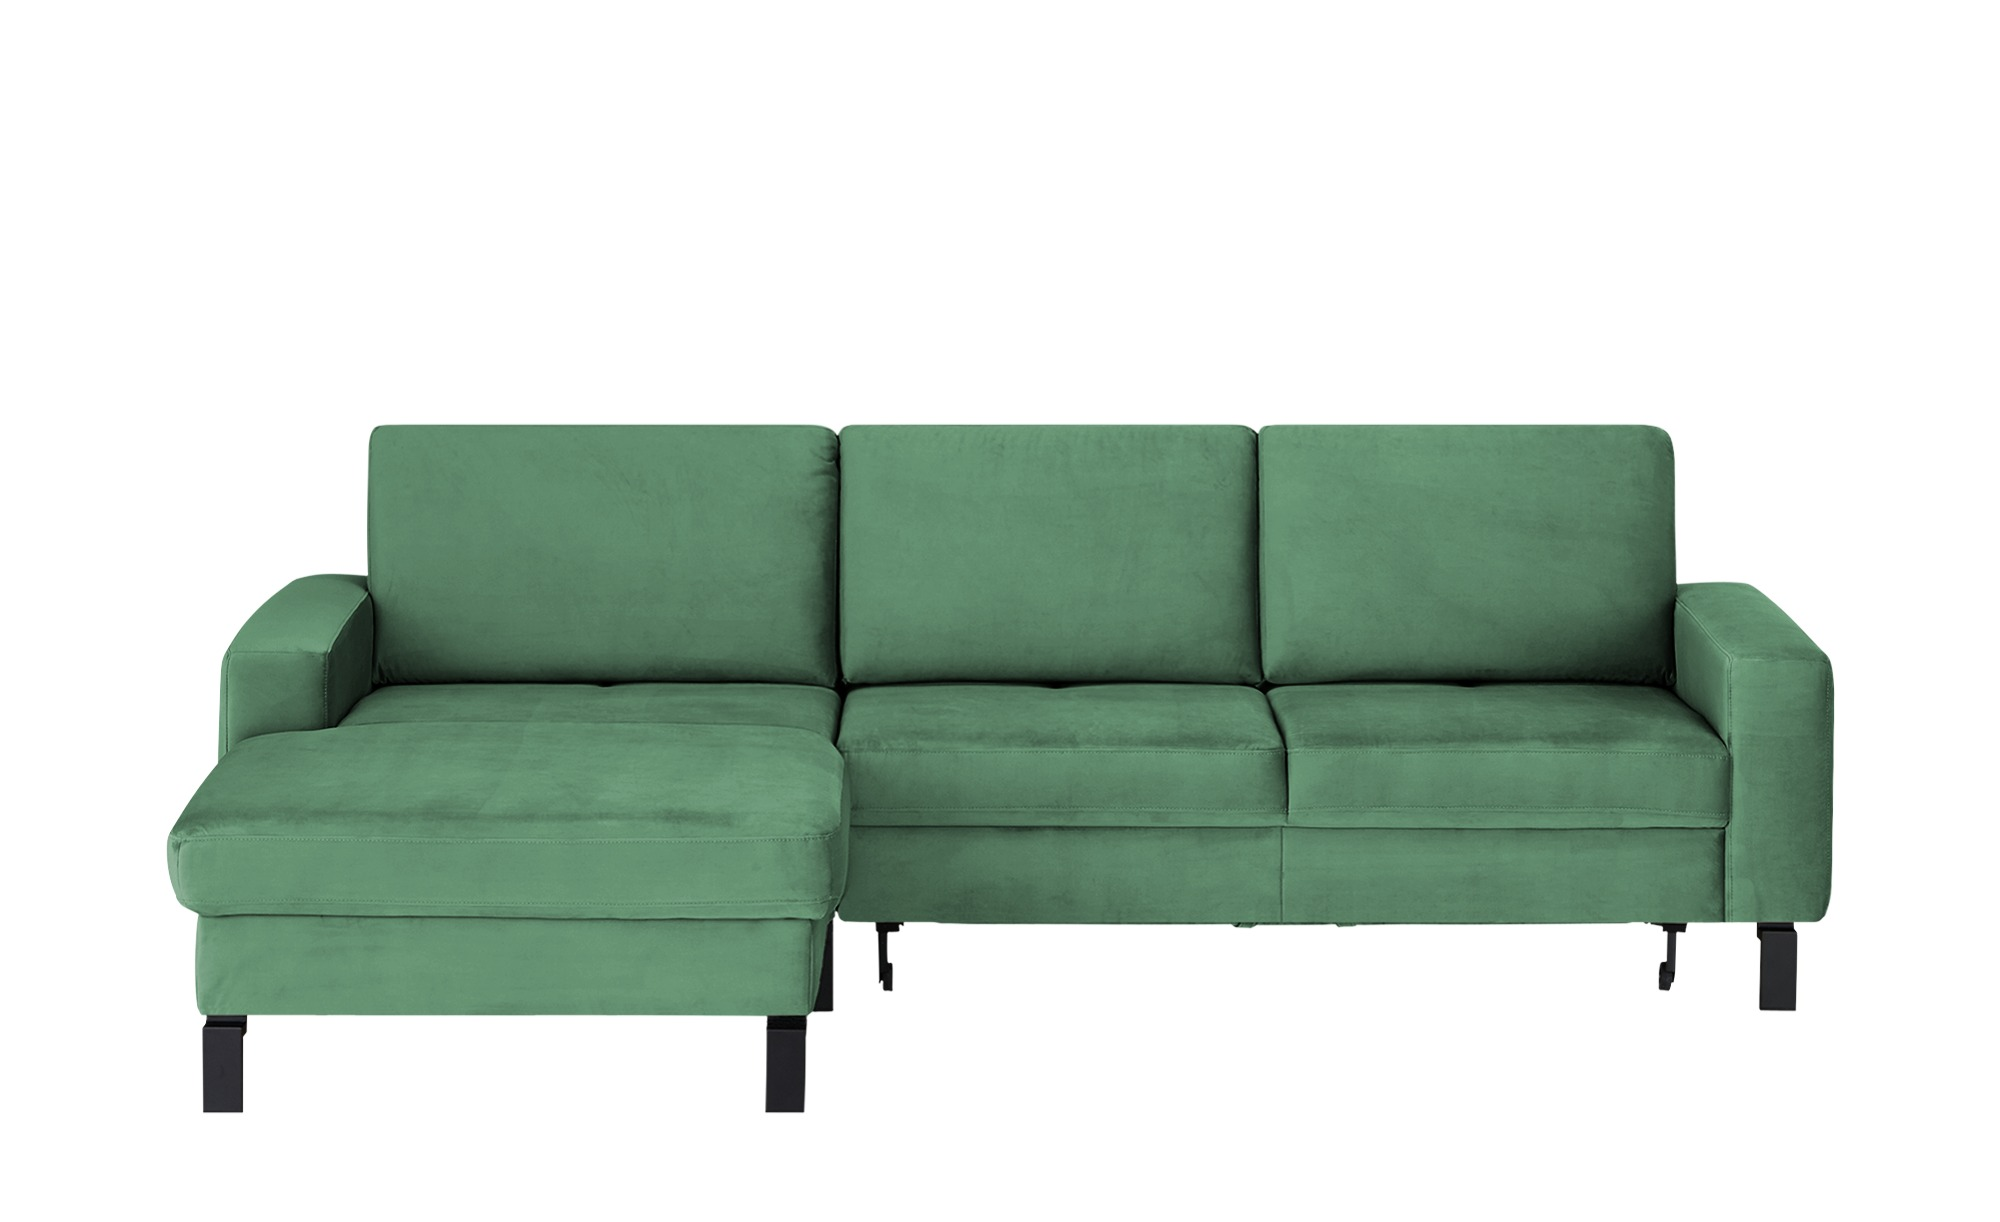 Ecksofa  Coline Move ¦ grün ¦ Maße (cm): H: 85 Polstermöbel > Sofas > Ecksofas - Höffner